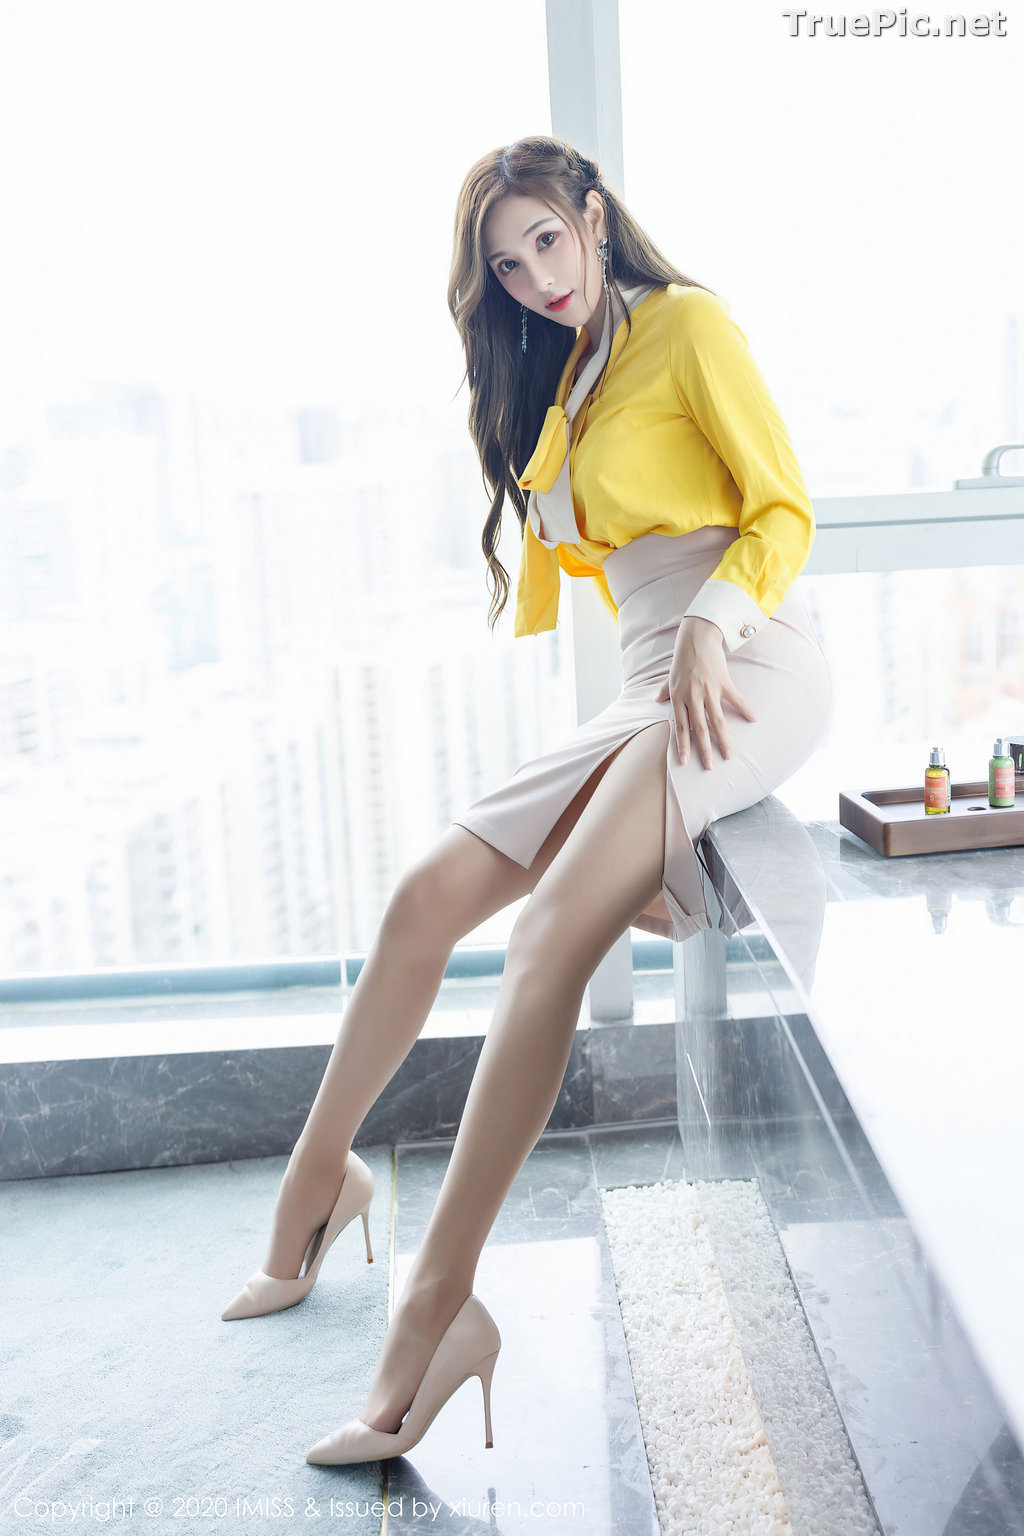 Image IMISS Vol.494 - Chinese Model - Lavinia肉肉 - Beautiful Long Legs Secretary - TruePic.net - Picture-4